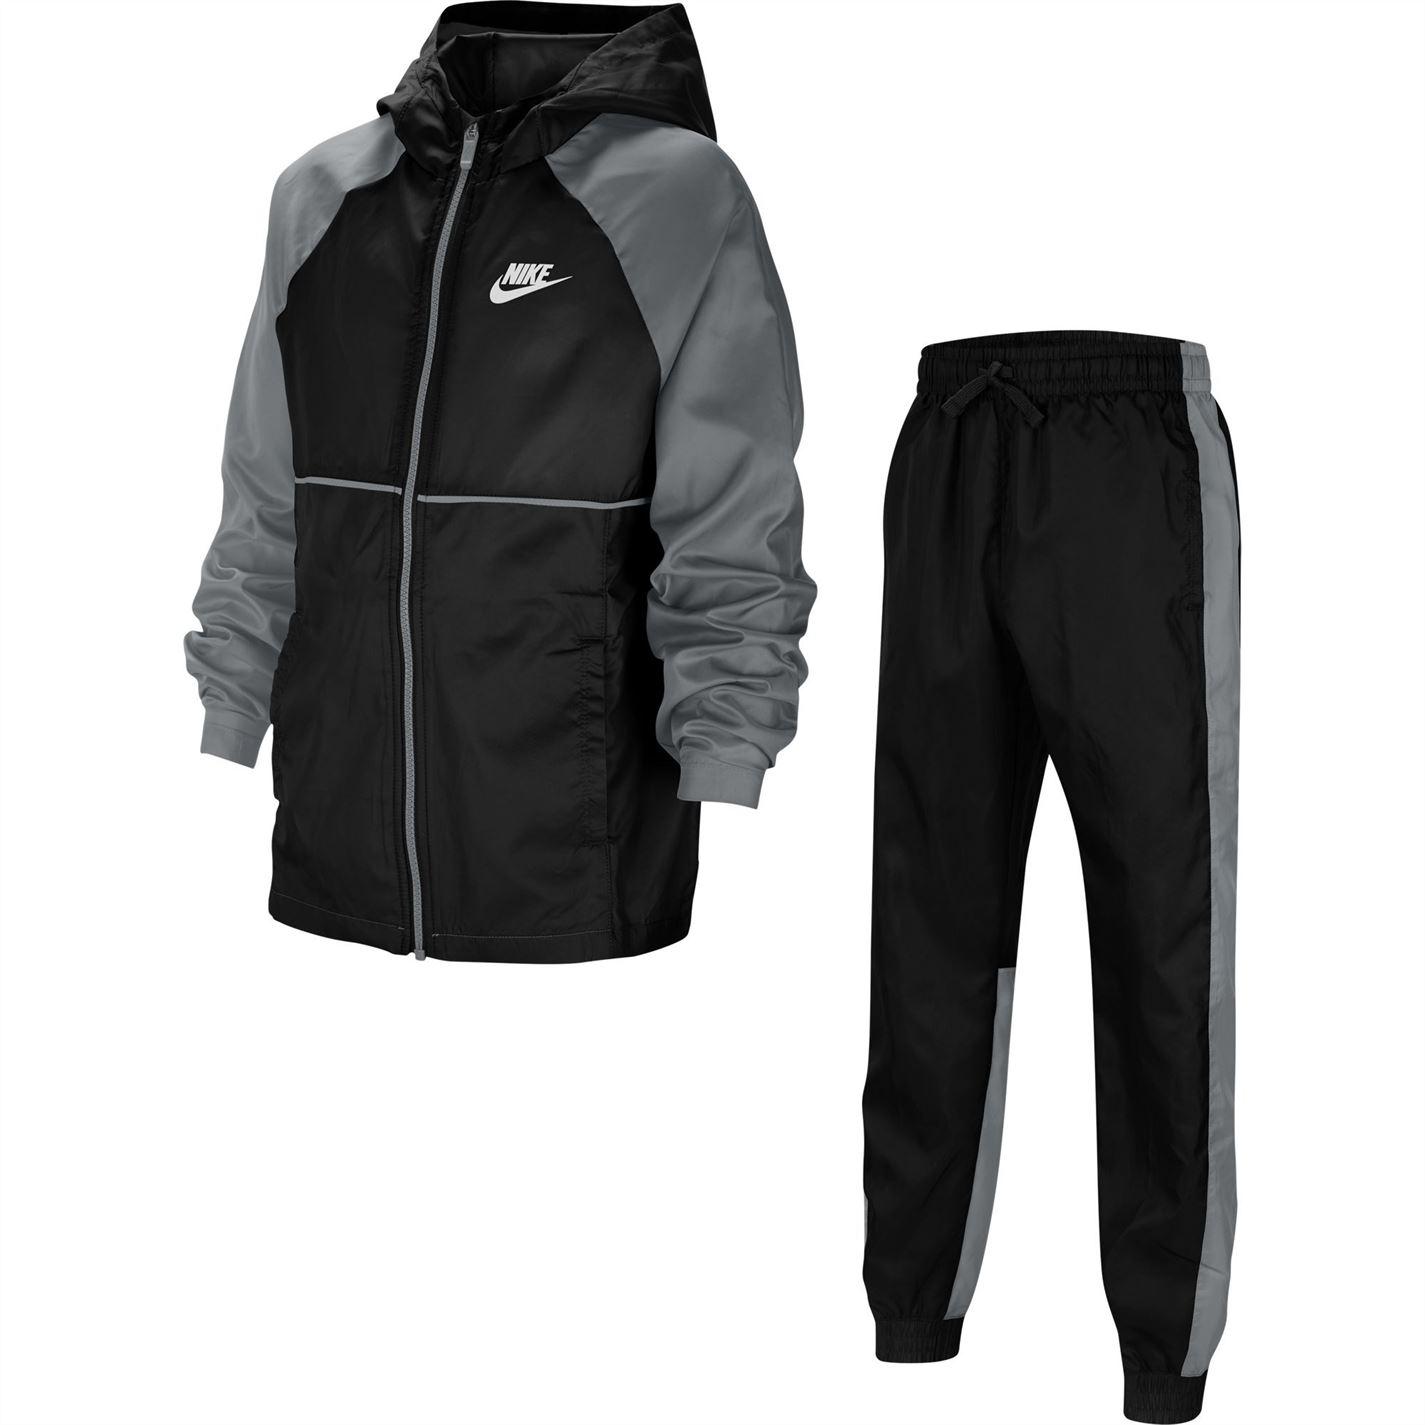 Mergi la Treninguri Nike Sportswear Big Woven pentru Copii negru gri alb